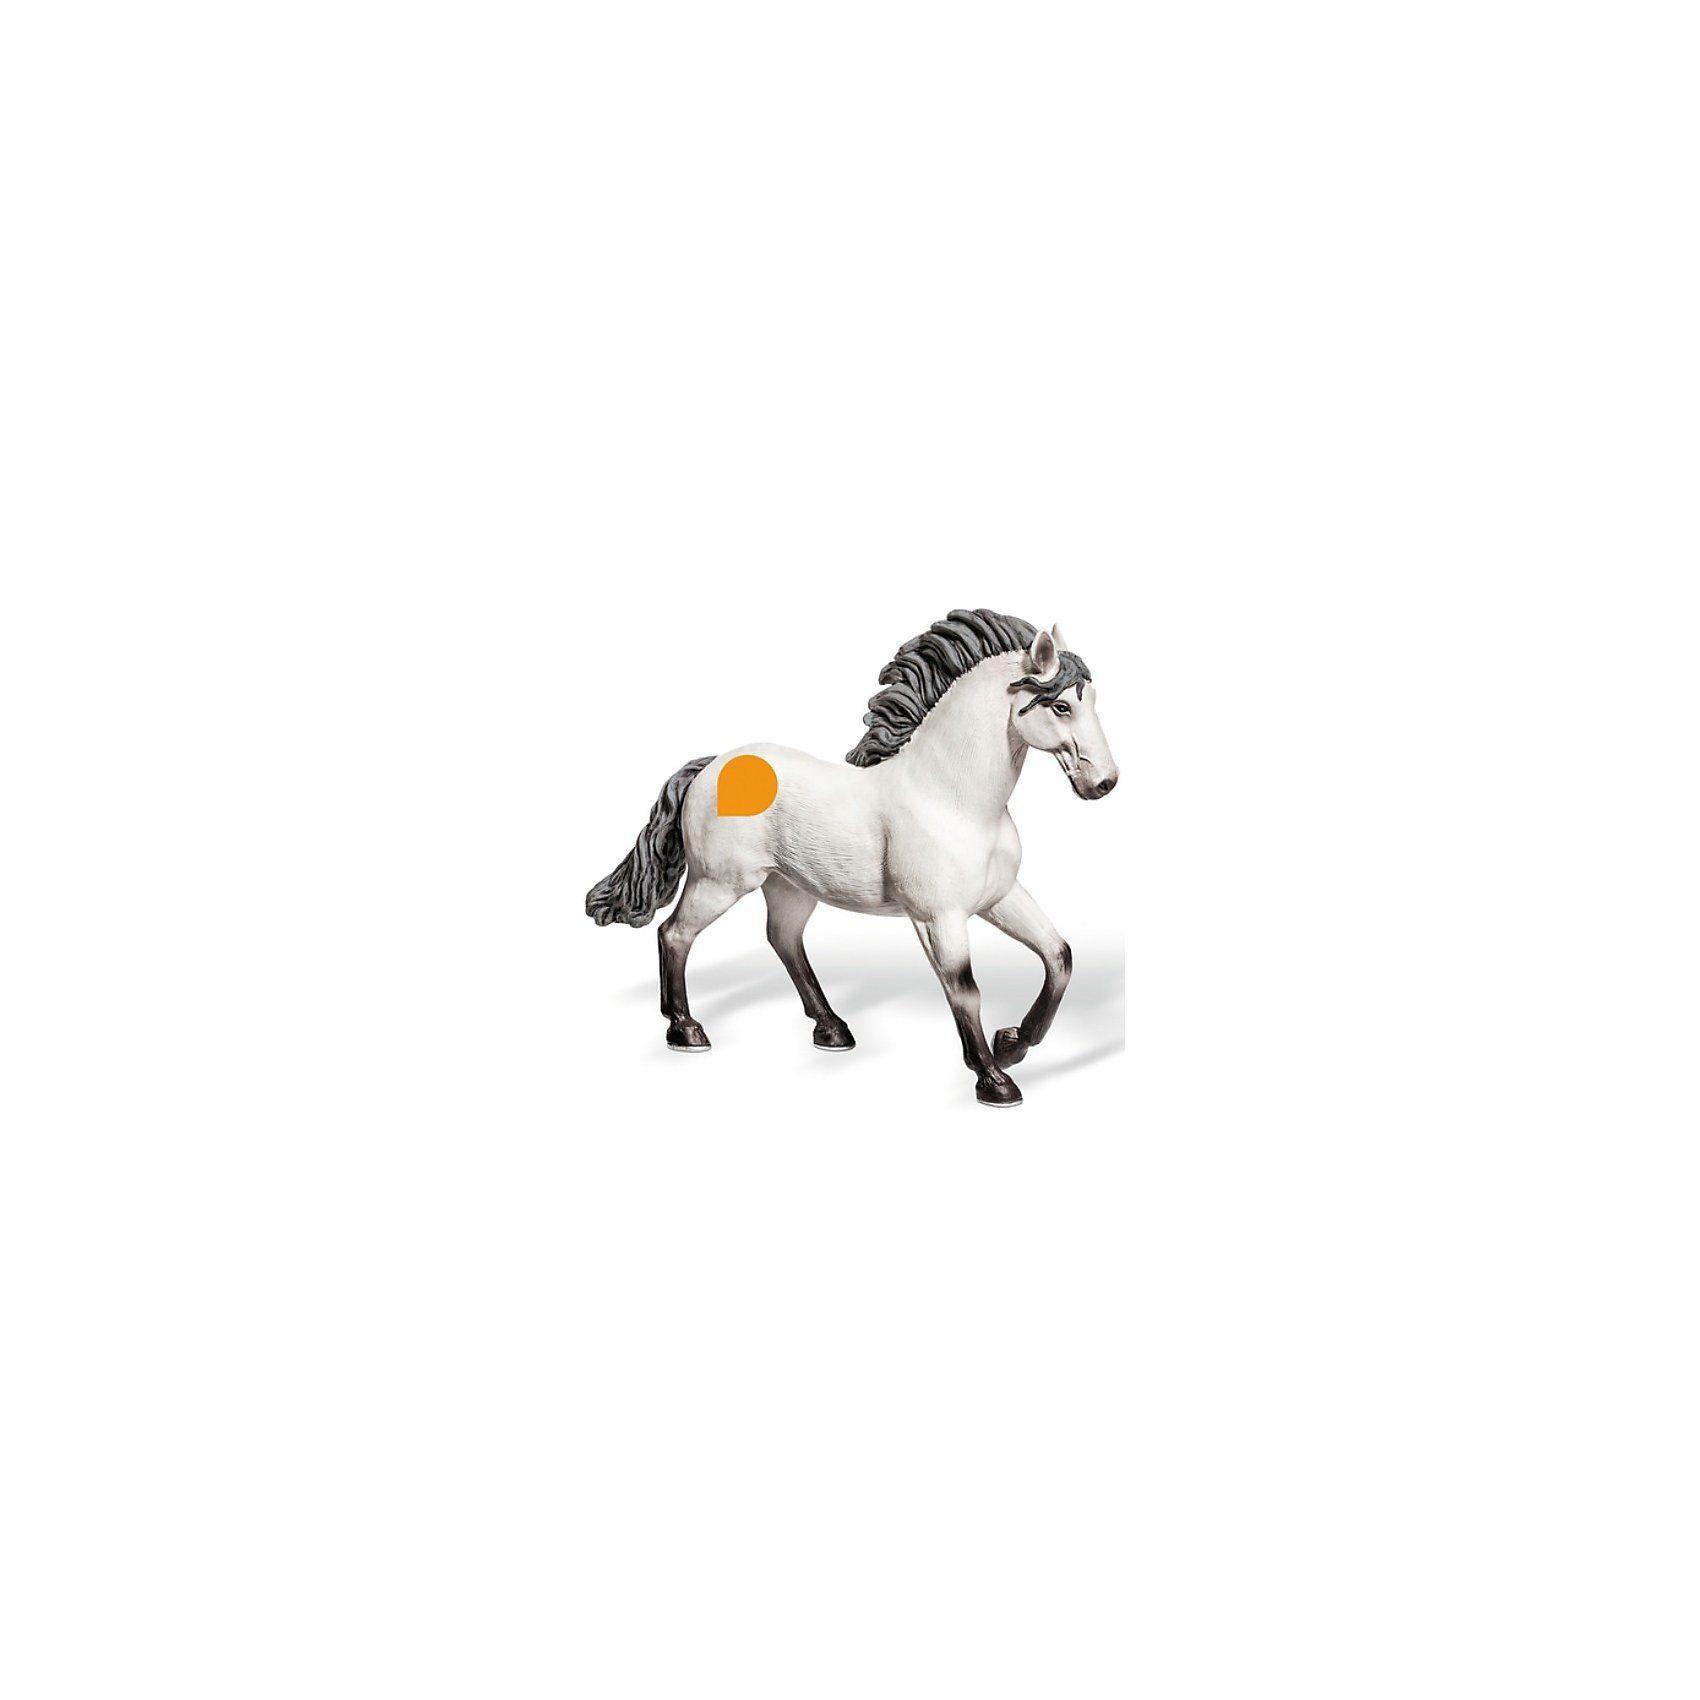 Ravensburger tiptoi® Spielfigur Andalusier Stute